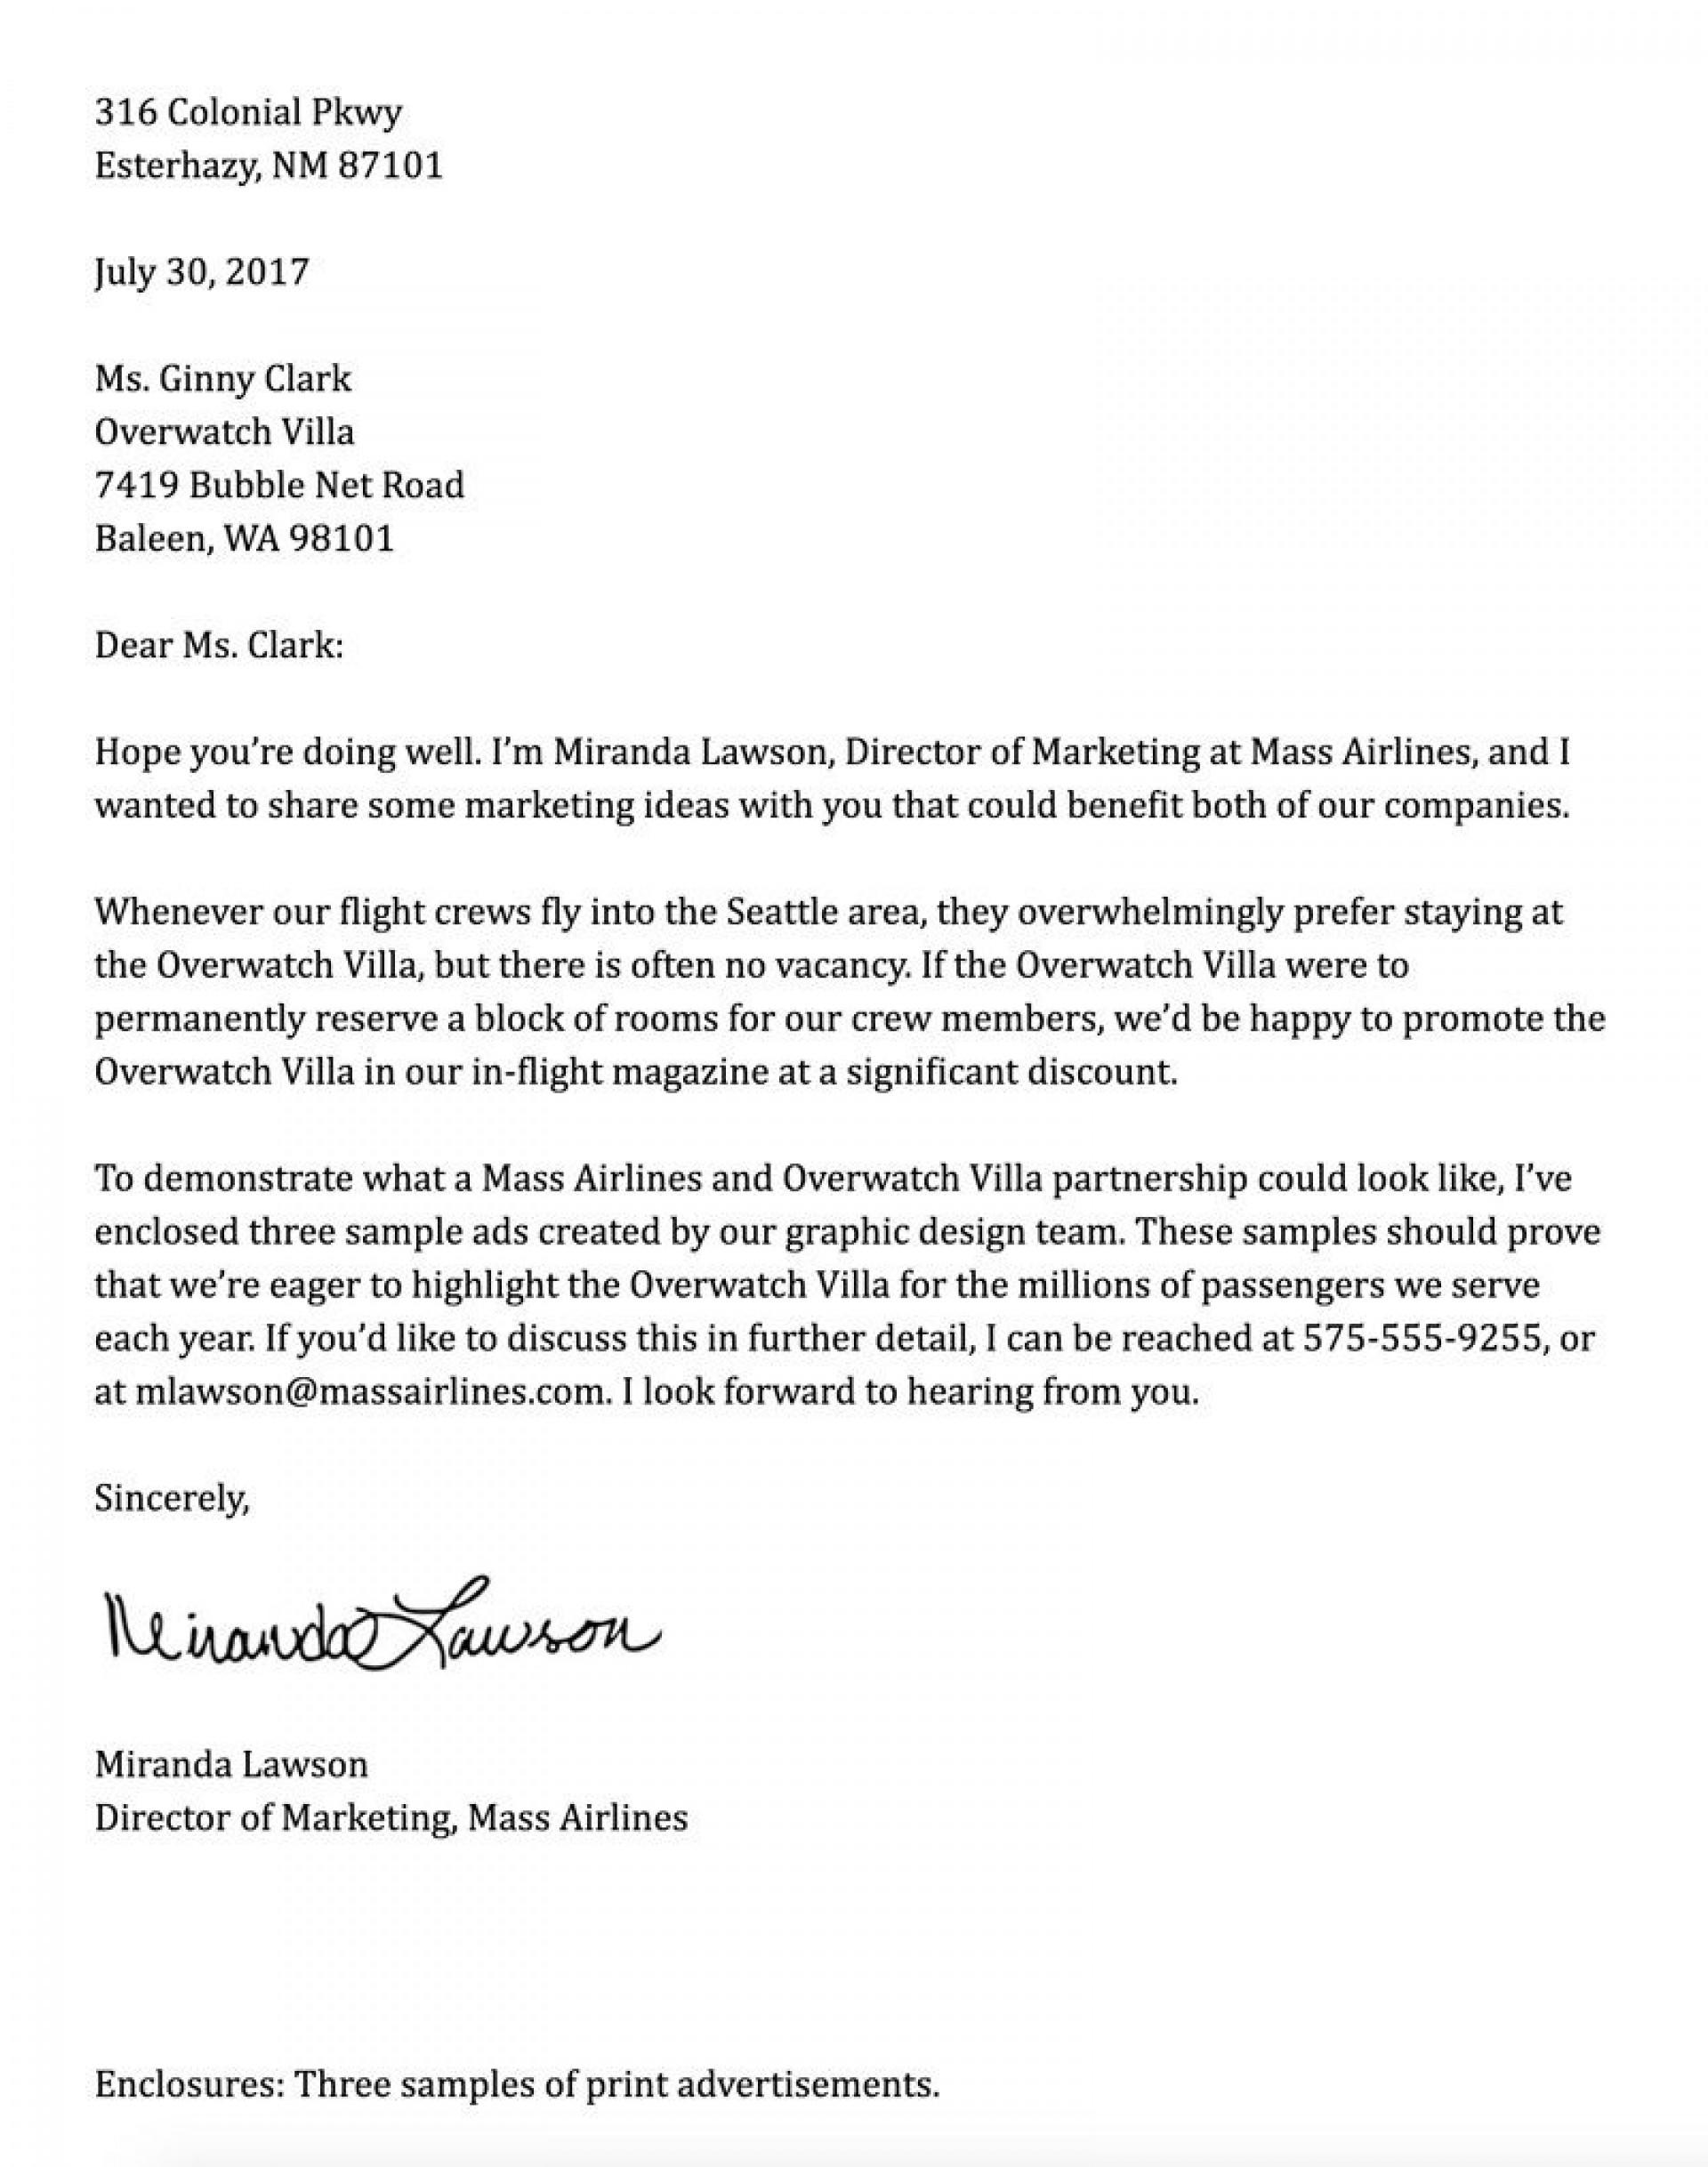 004 Marvelou Formal Busines Letter Template Photo  Pdf Australia Format1920